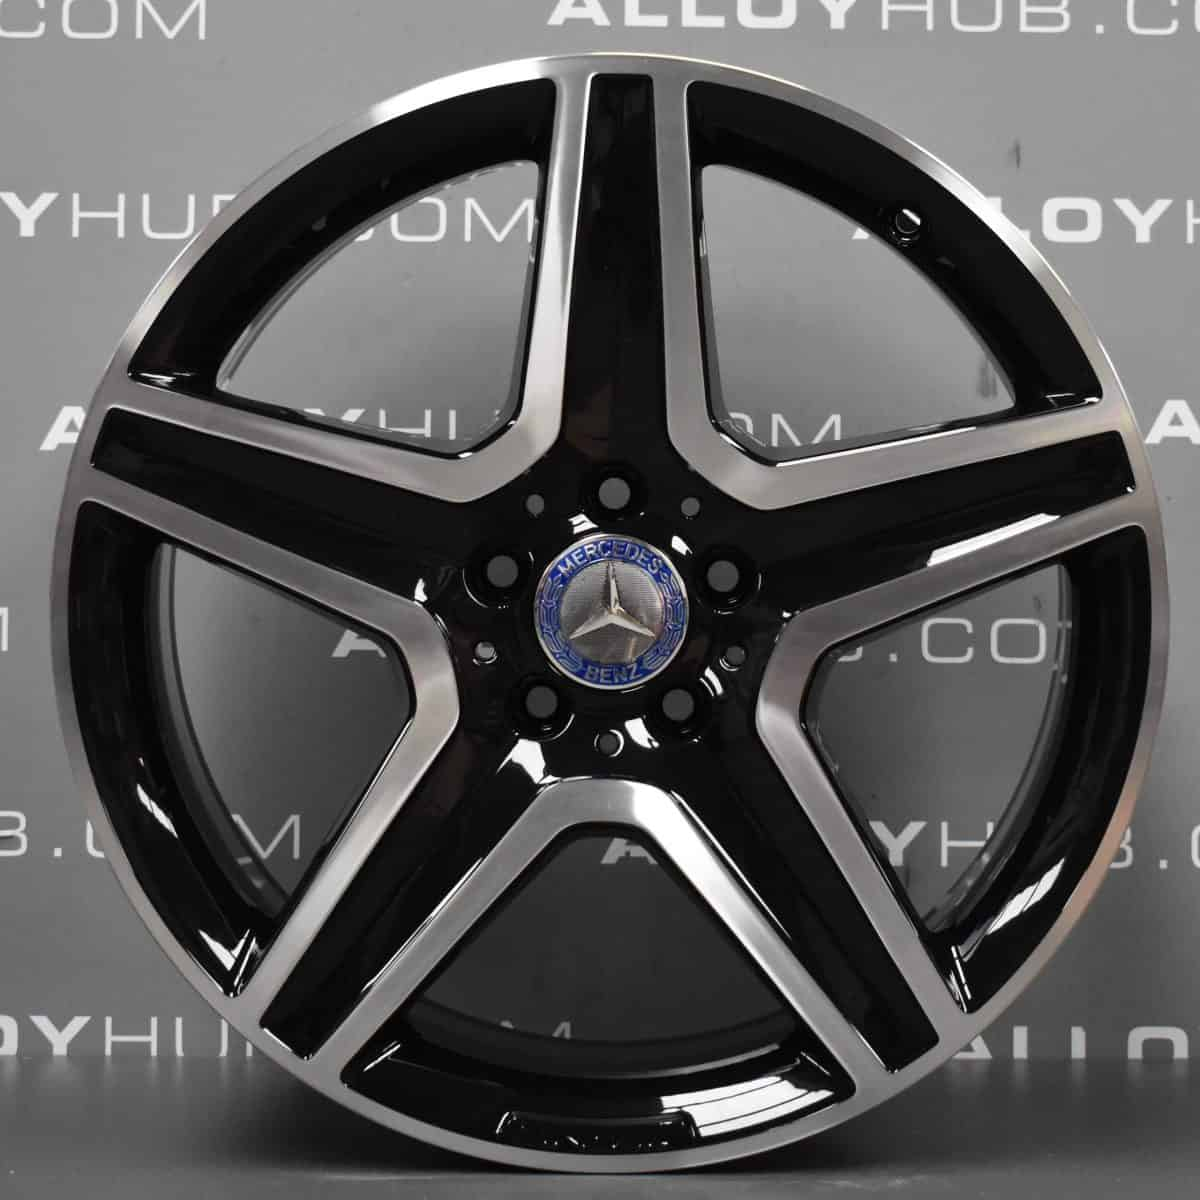 "Genuine Mercedes-Benz GLA X156 AMG 19"" inch 5 Spoke Alloy Wheels with Gloss Black & Diamond Turned Finish A1564010600"